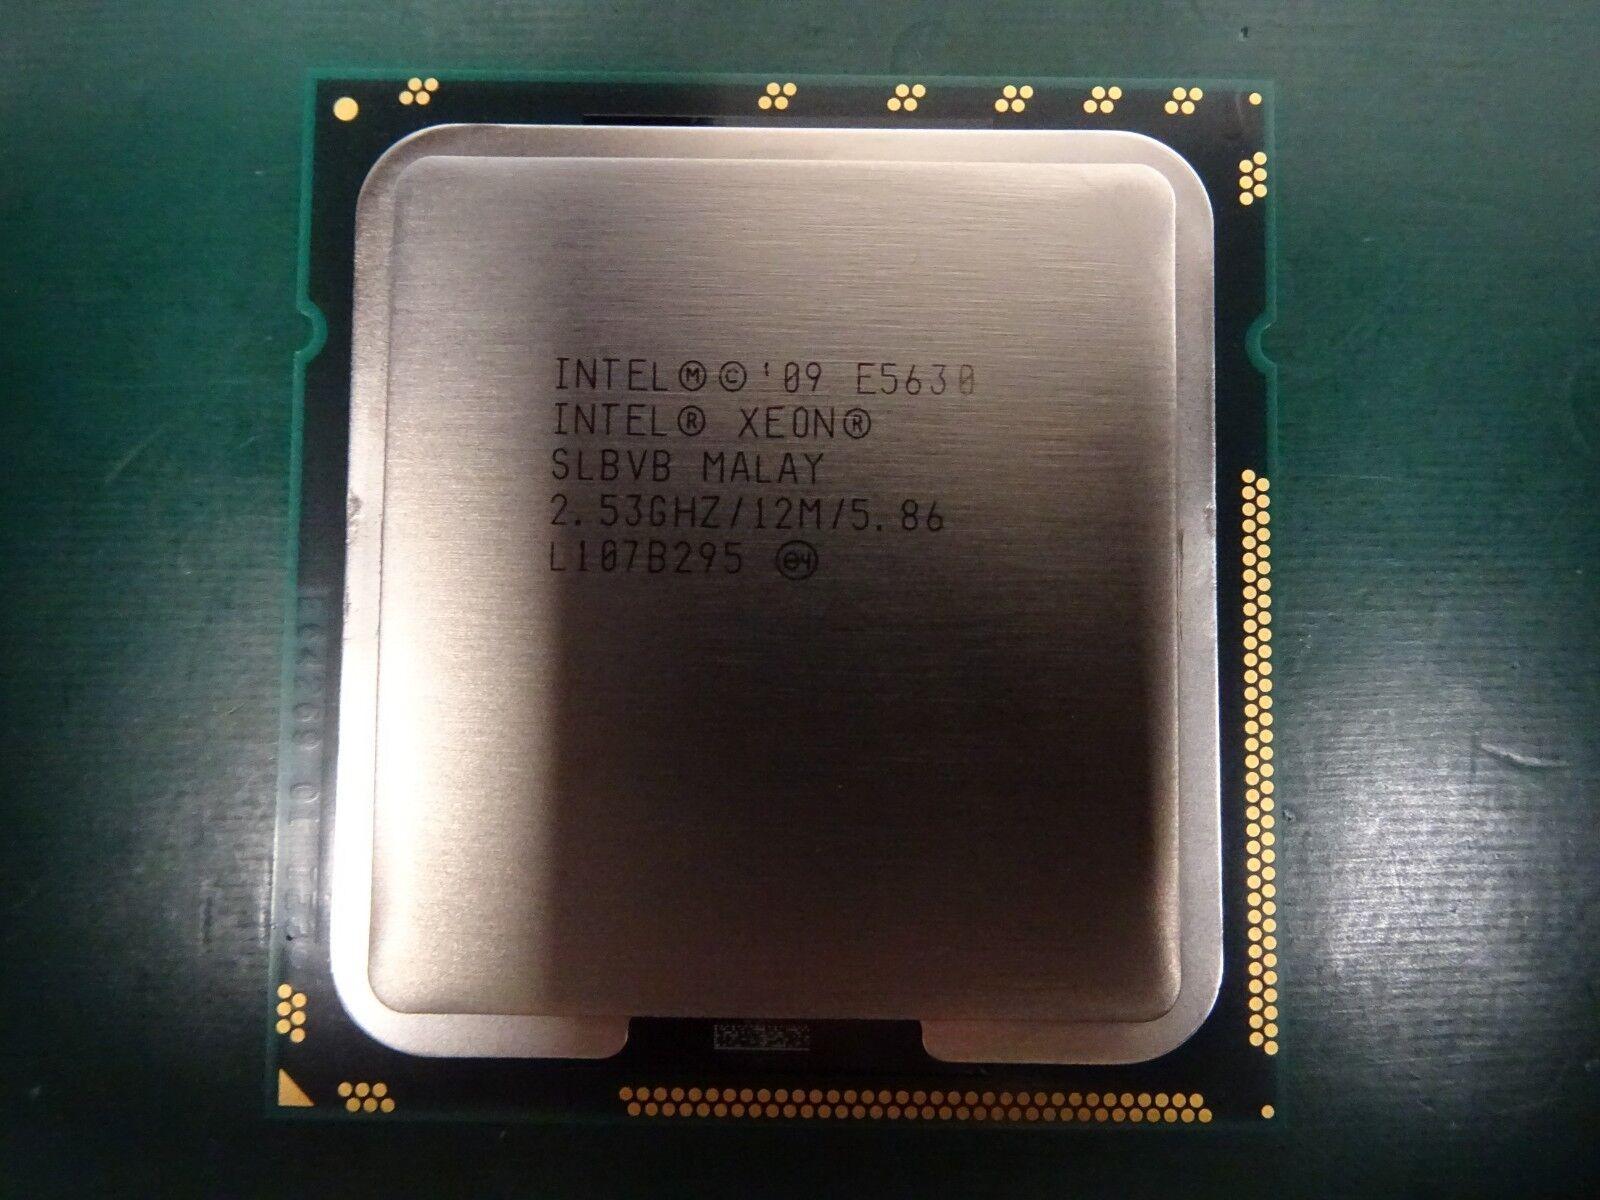 Lot of 12 Intel Xeon E5630 2.53GHz 12MB 5.86 GT//S SLBVB CPU Server Processor